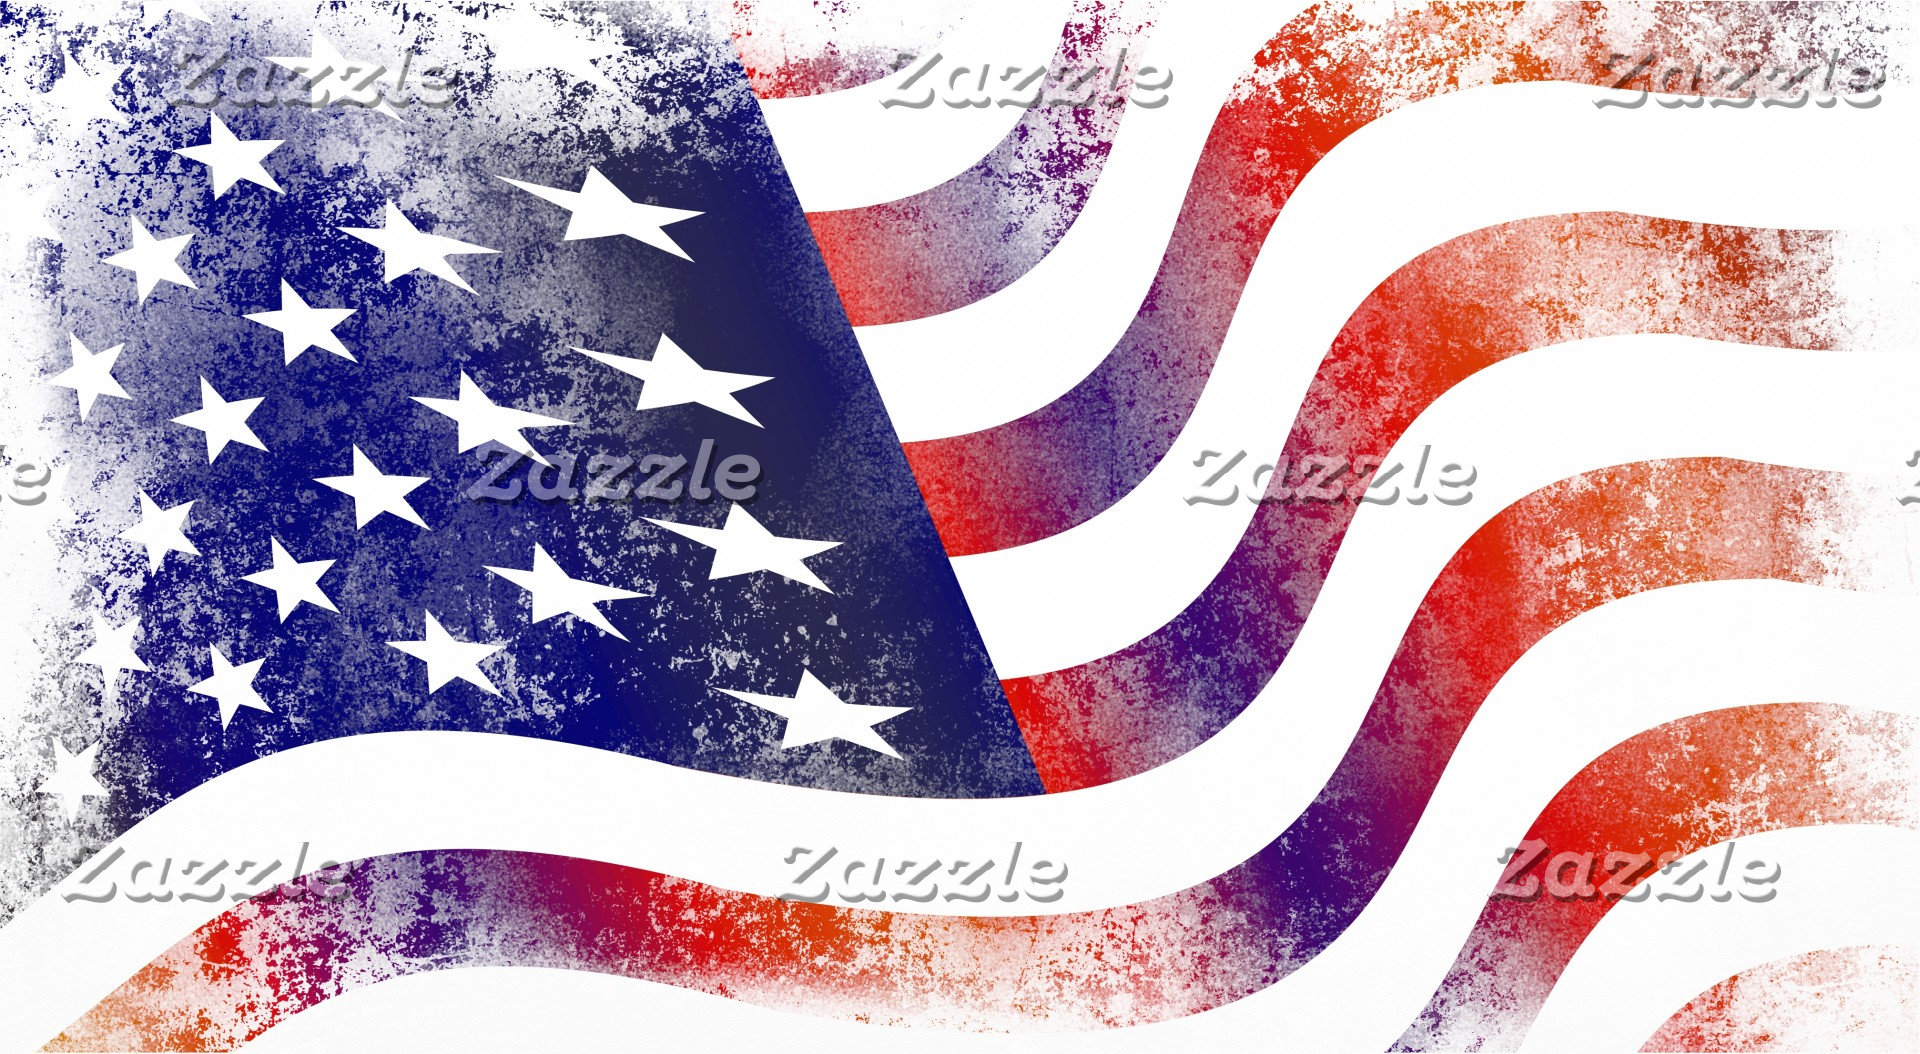 USA/America